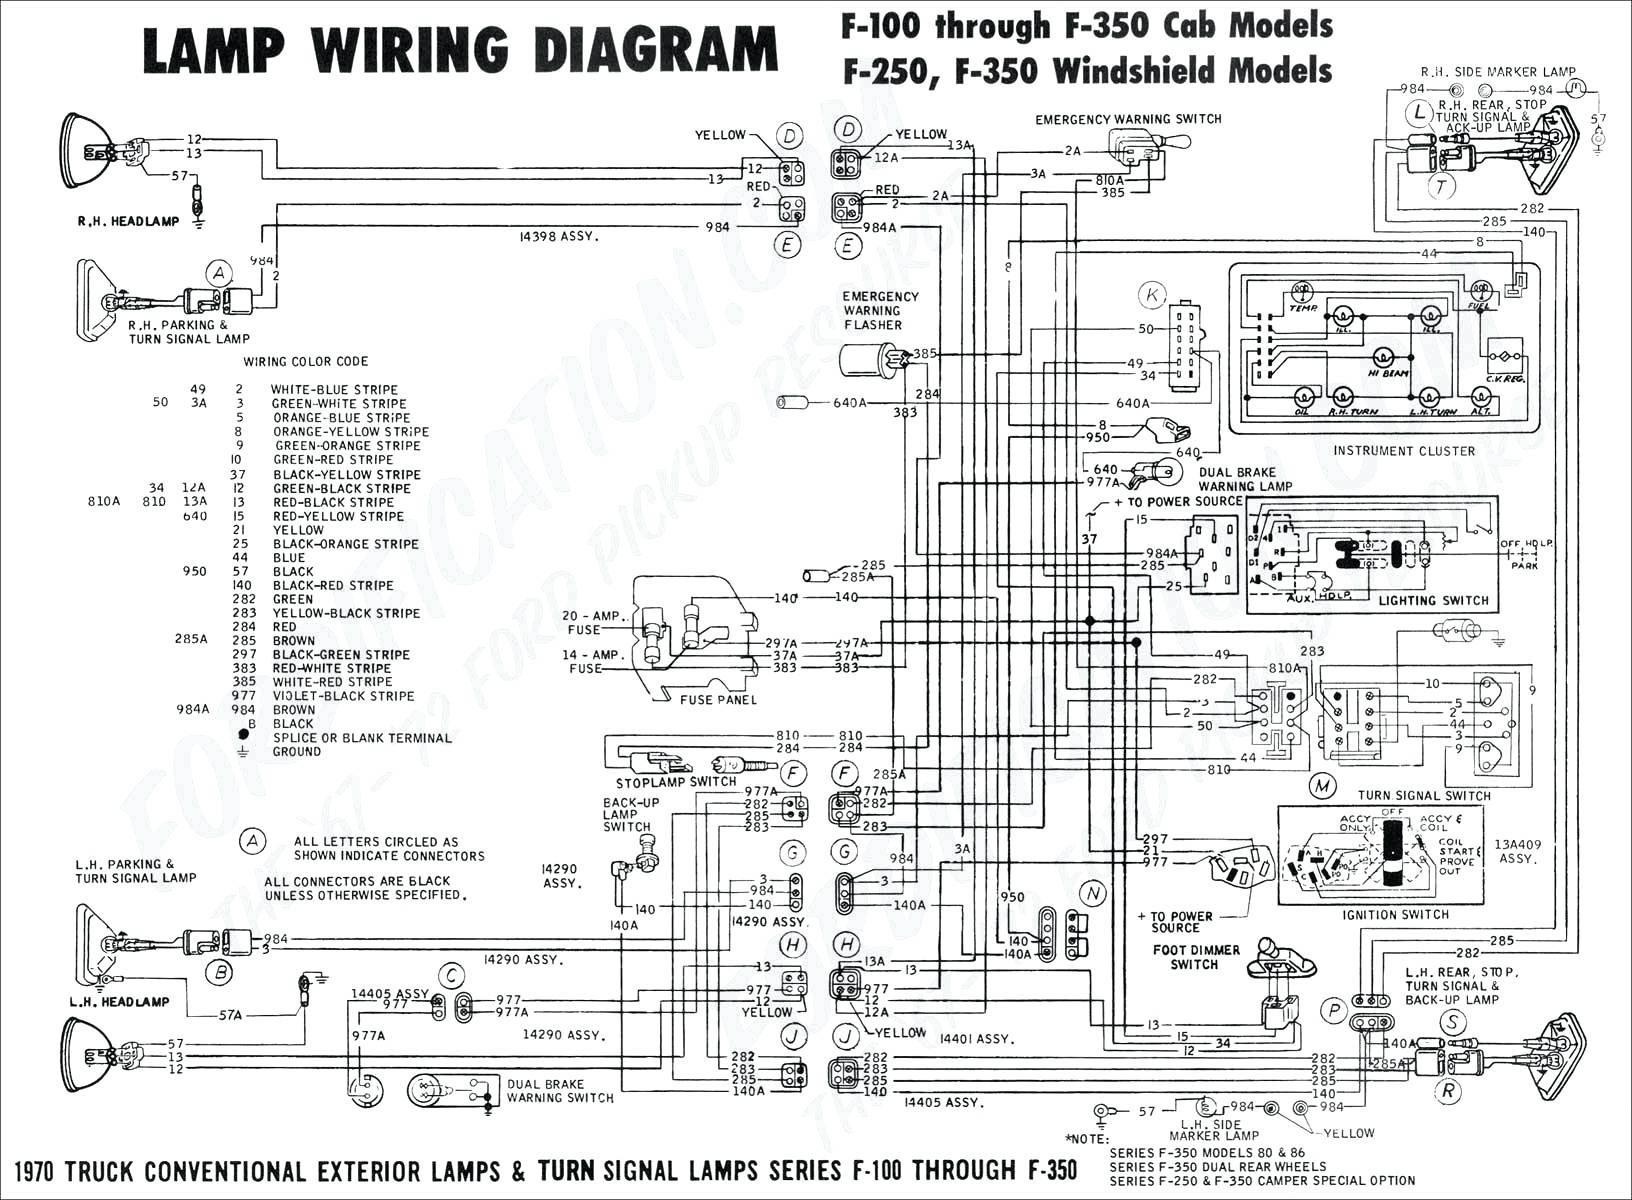 Brake Light Wire Diagram Chevy Silverado Wiring Diagram for 1997 Best Truck Radio Suburban Of Brake Light Wire Diagram